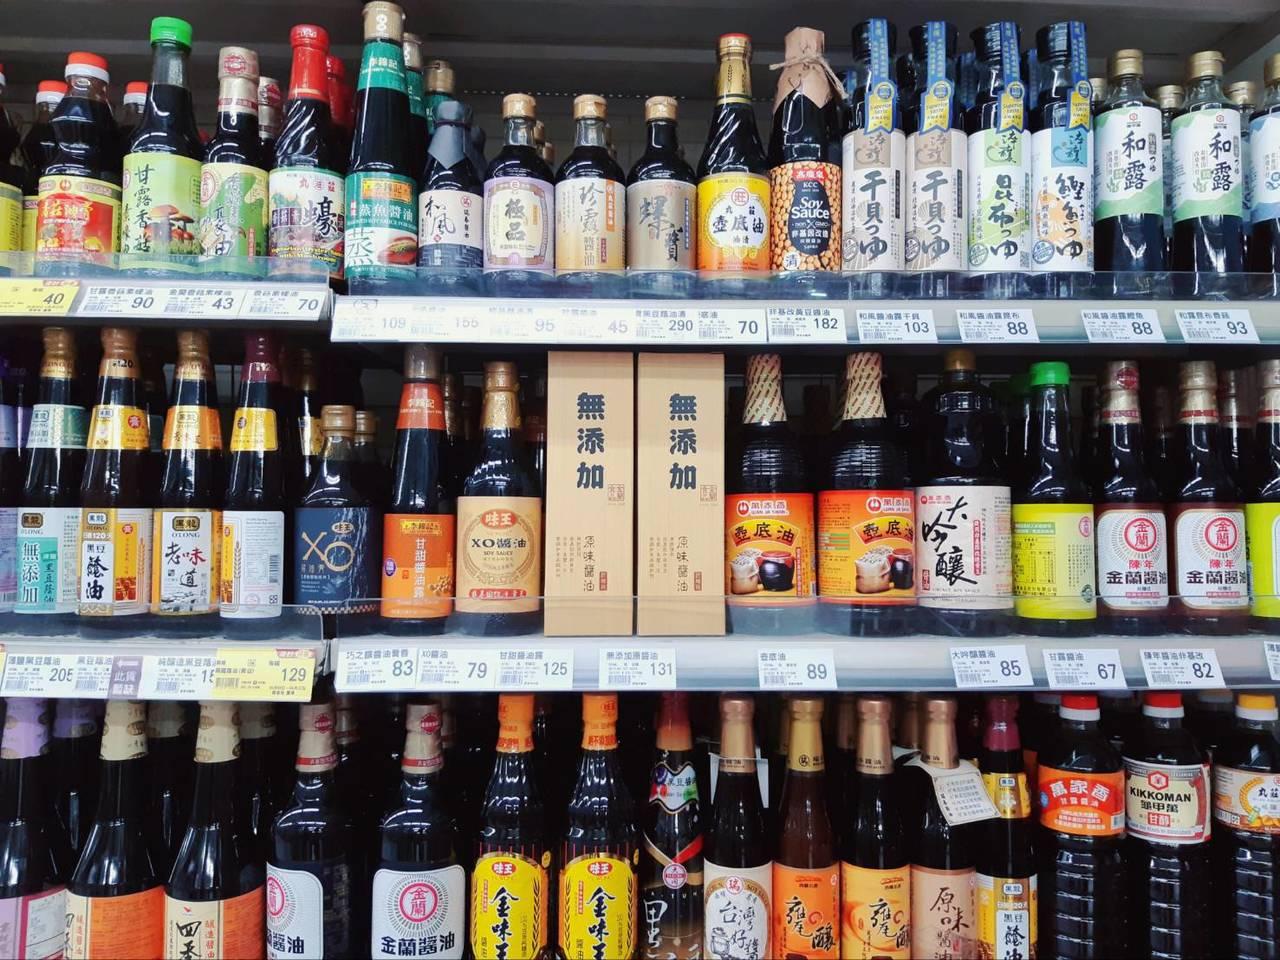 Clean Label趨勢席捲全球,國內醬油廠也加入行列。